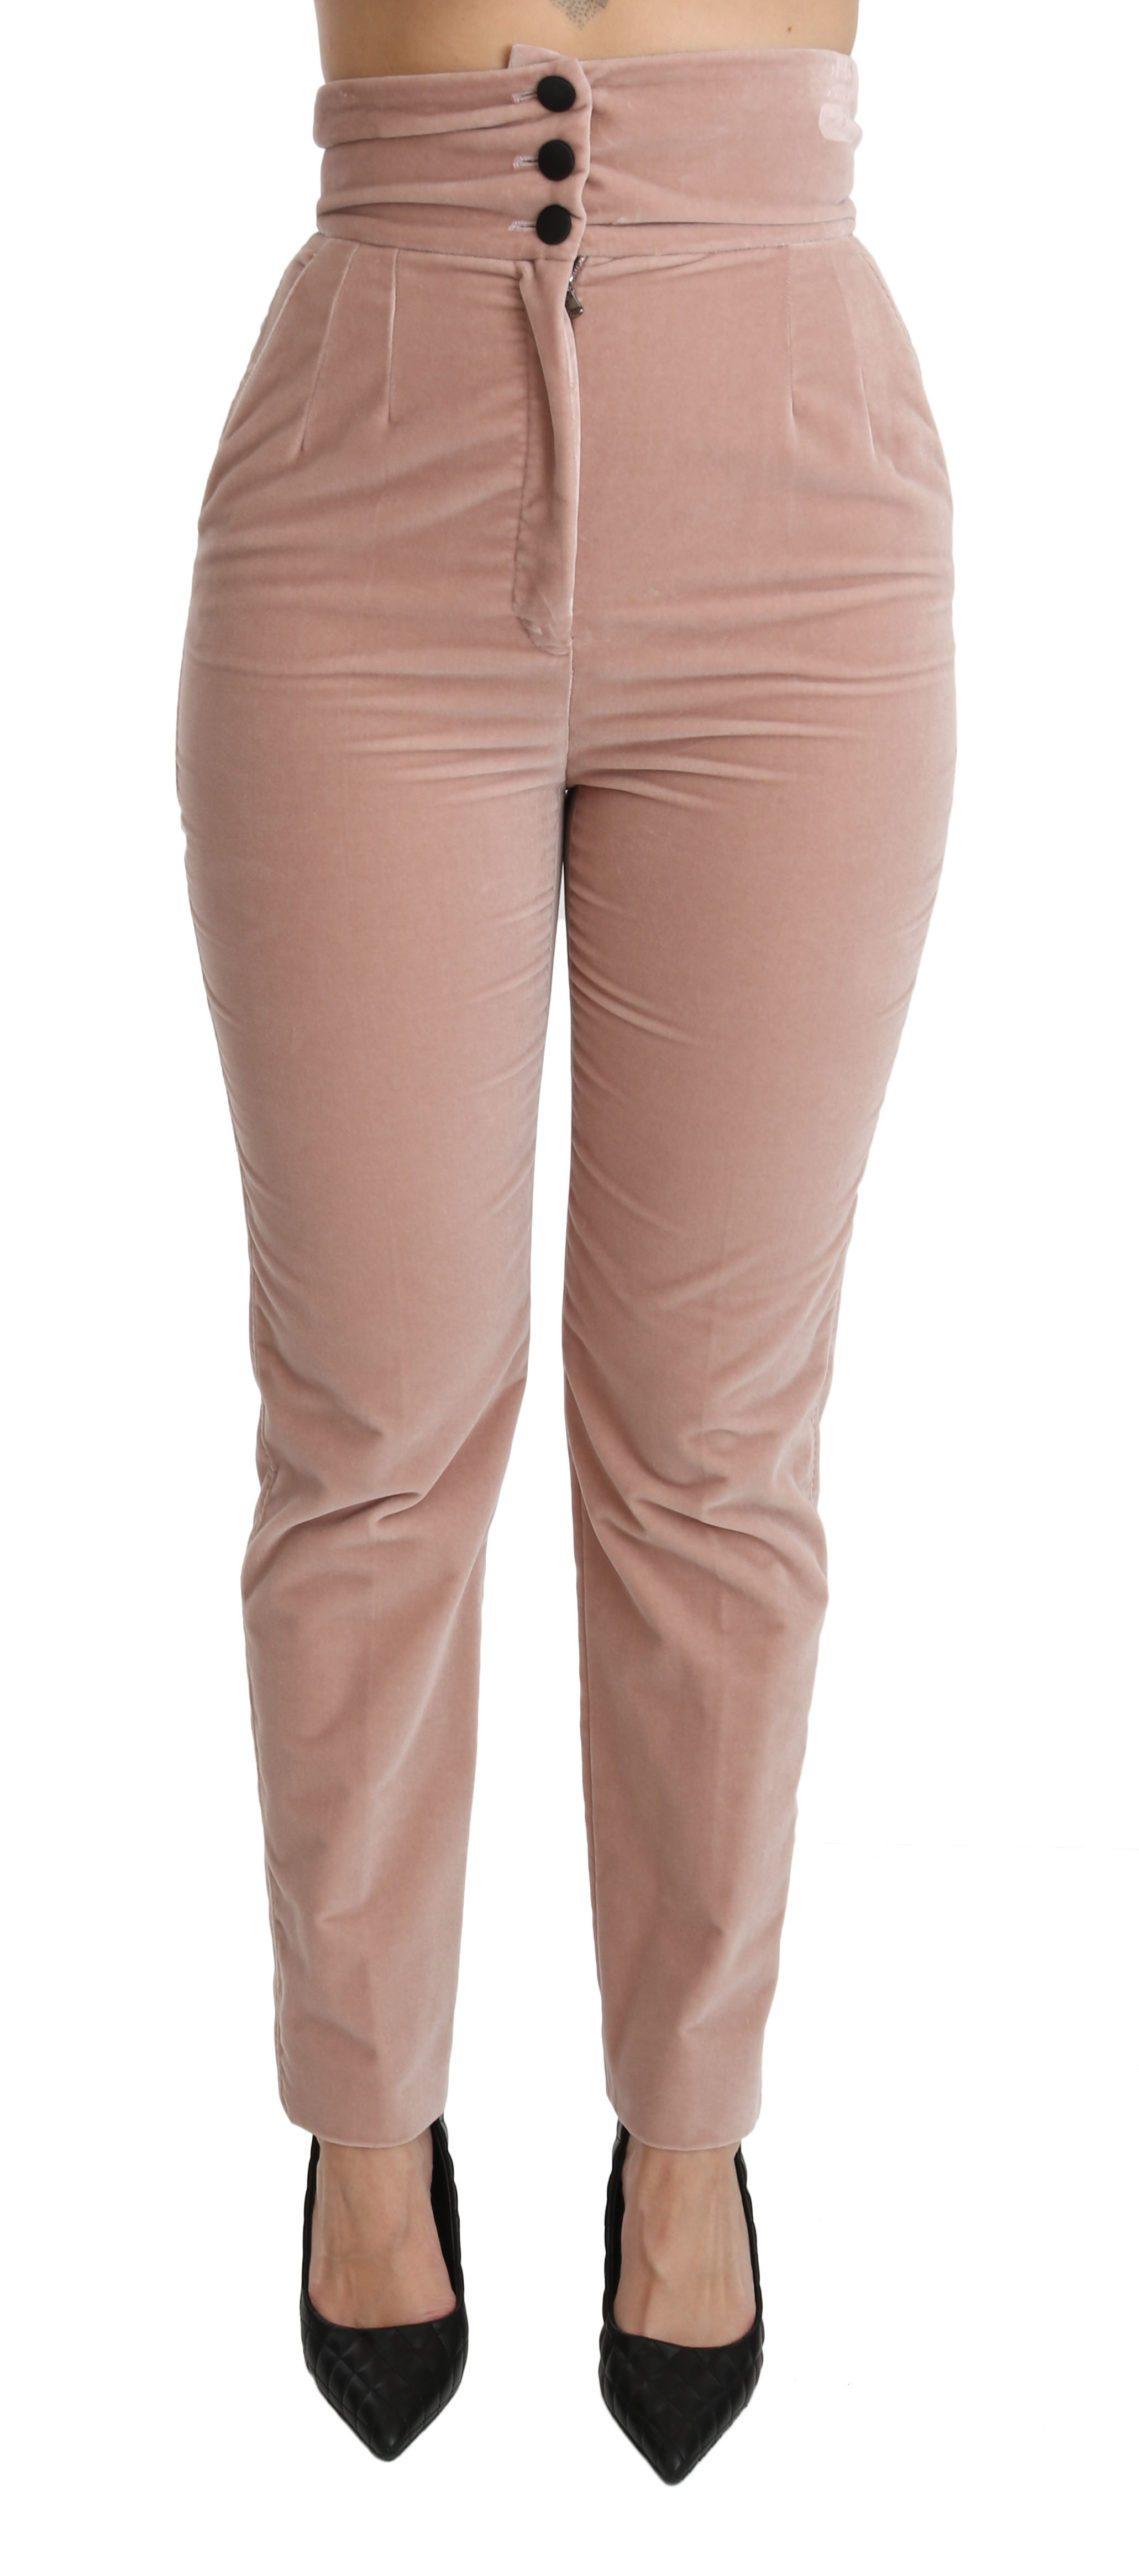 Dolce & Gabbana Women's Slim Fit High Waist Cotton Trouser Pink PAN70851 - IT40 S